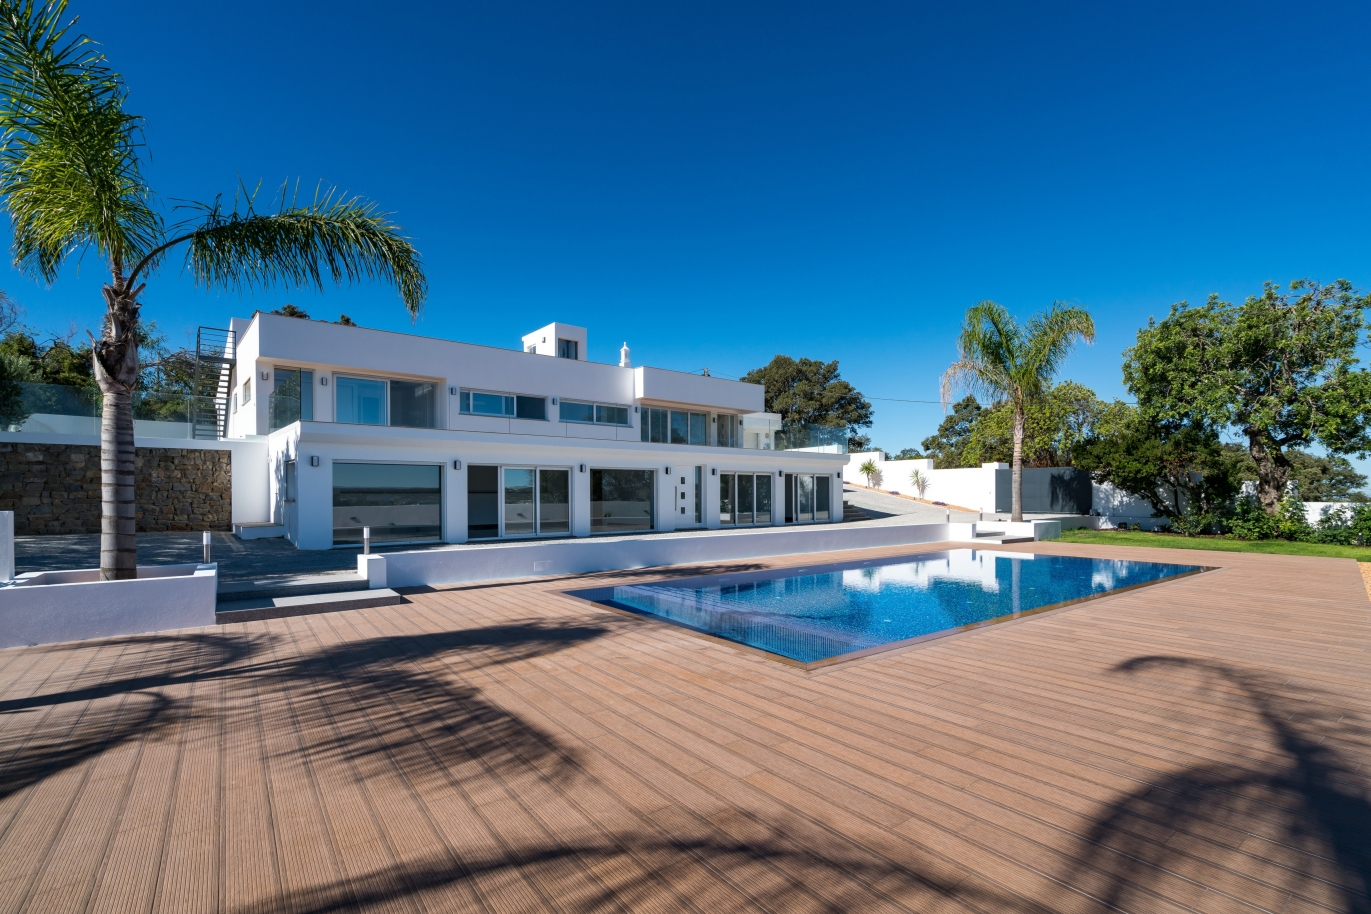 new-5-bedroom-villa-with-swimming-pool-santa-barbara-de-nexe-algarve